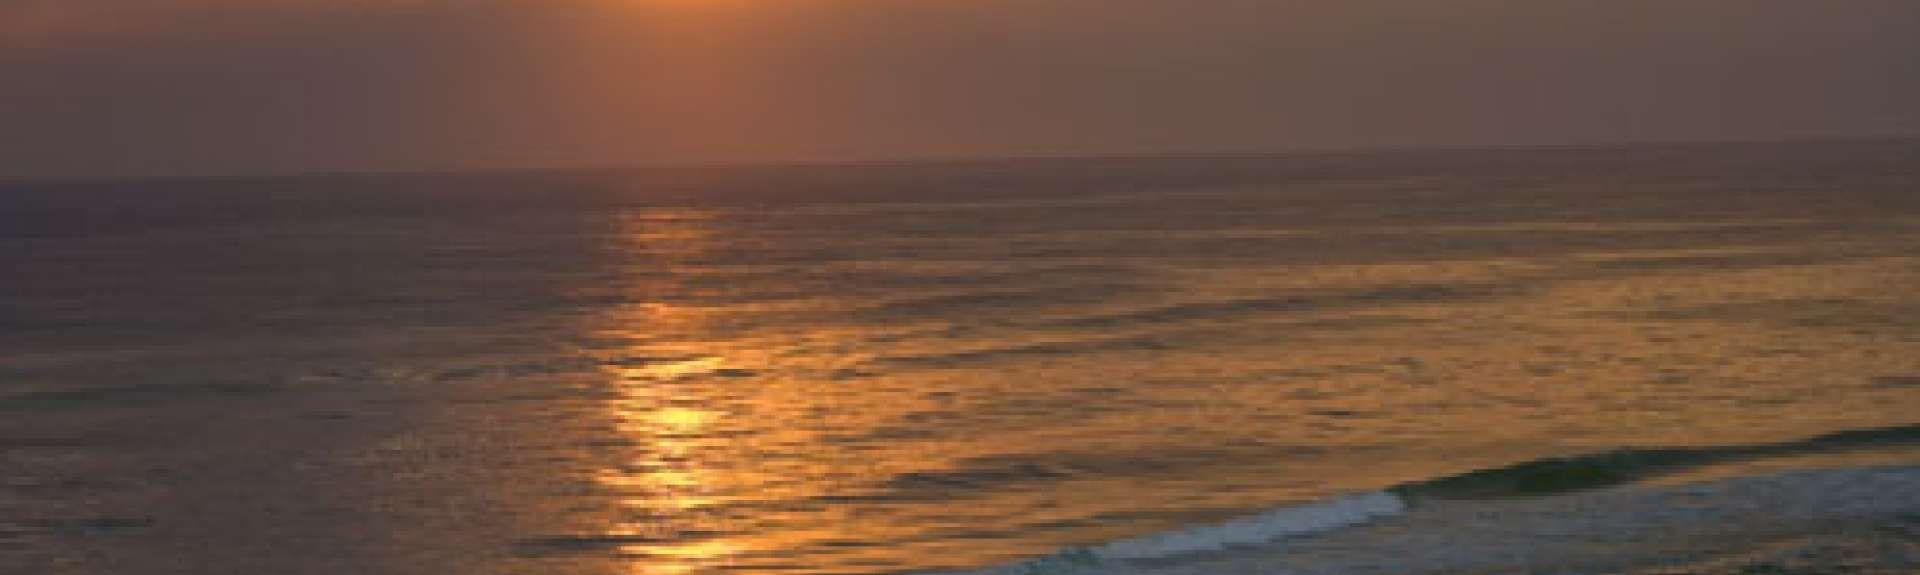 Carillon Beach Ph XX (Florida, Yhdysvallat)